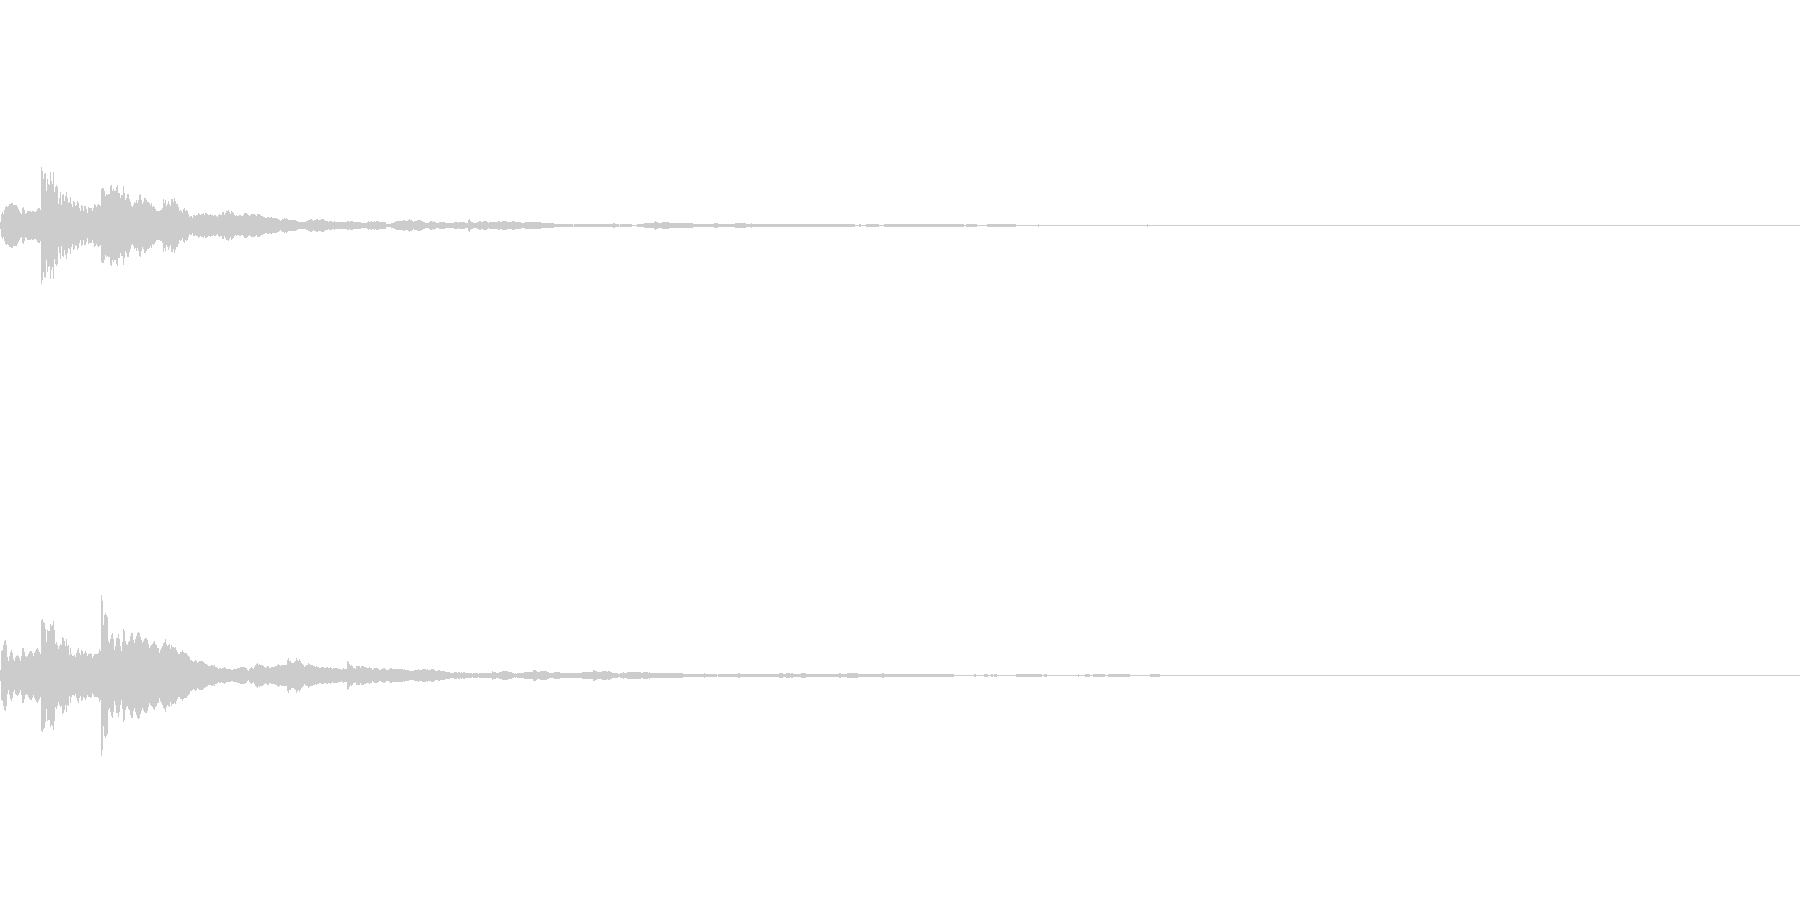 【SE 効果音】ティロリロんの未再生の波形